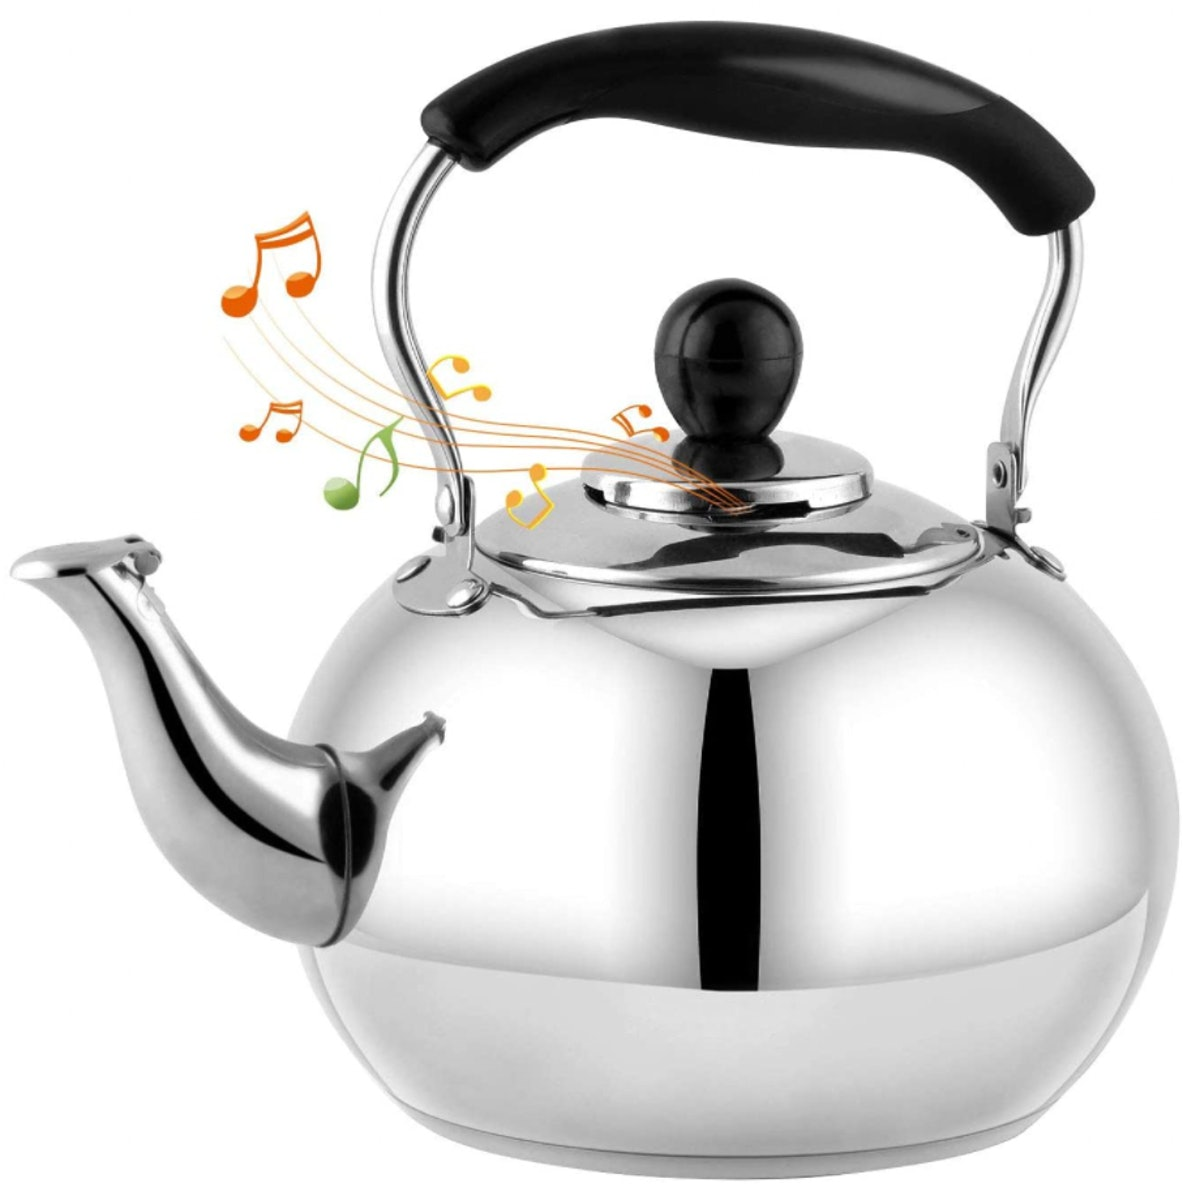 DclobTop Whistling Tea Kettle